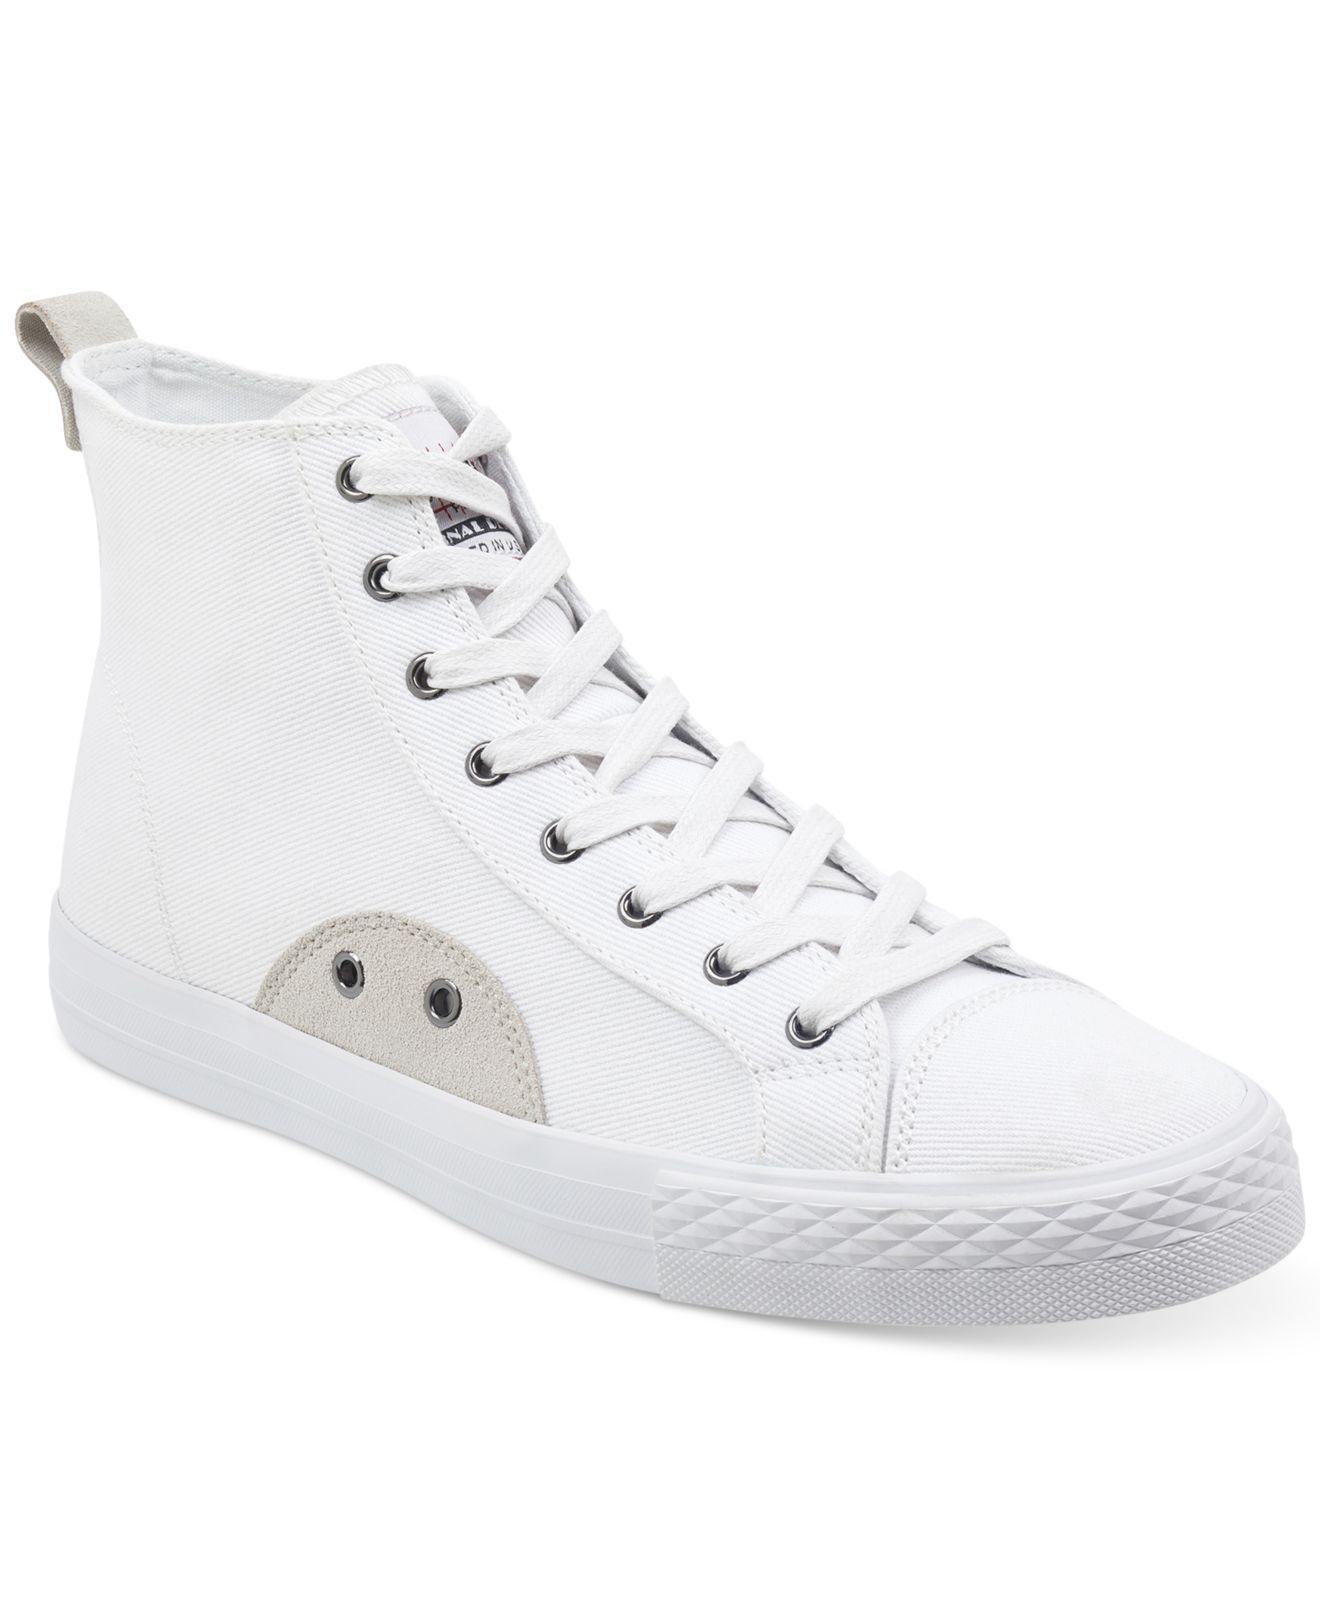 Guess Men's Perio High-Top Sneakers Men's Shoes ndcORJ